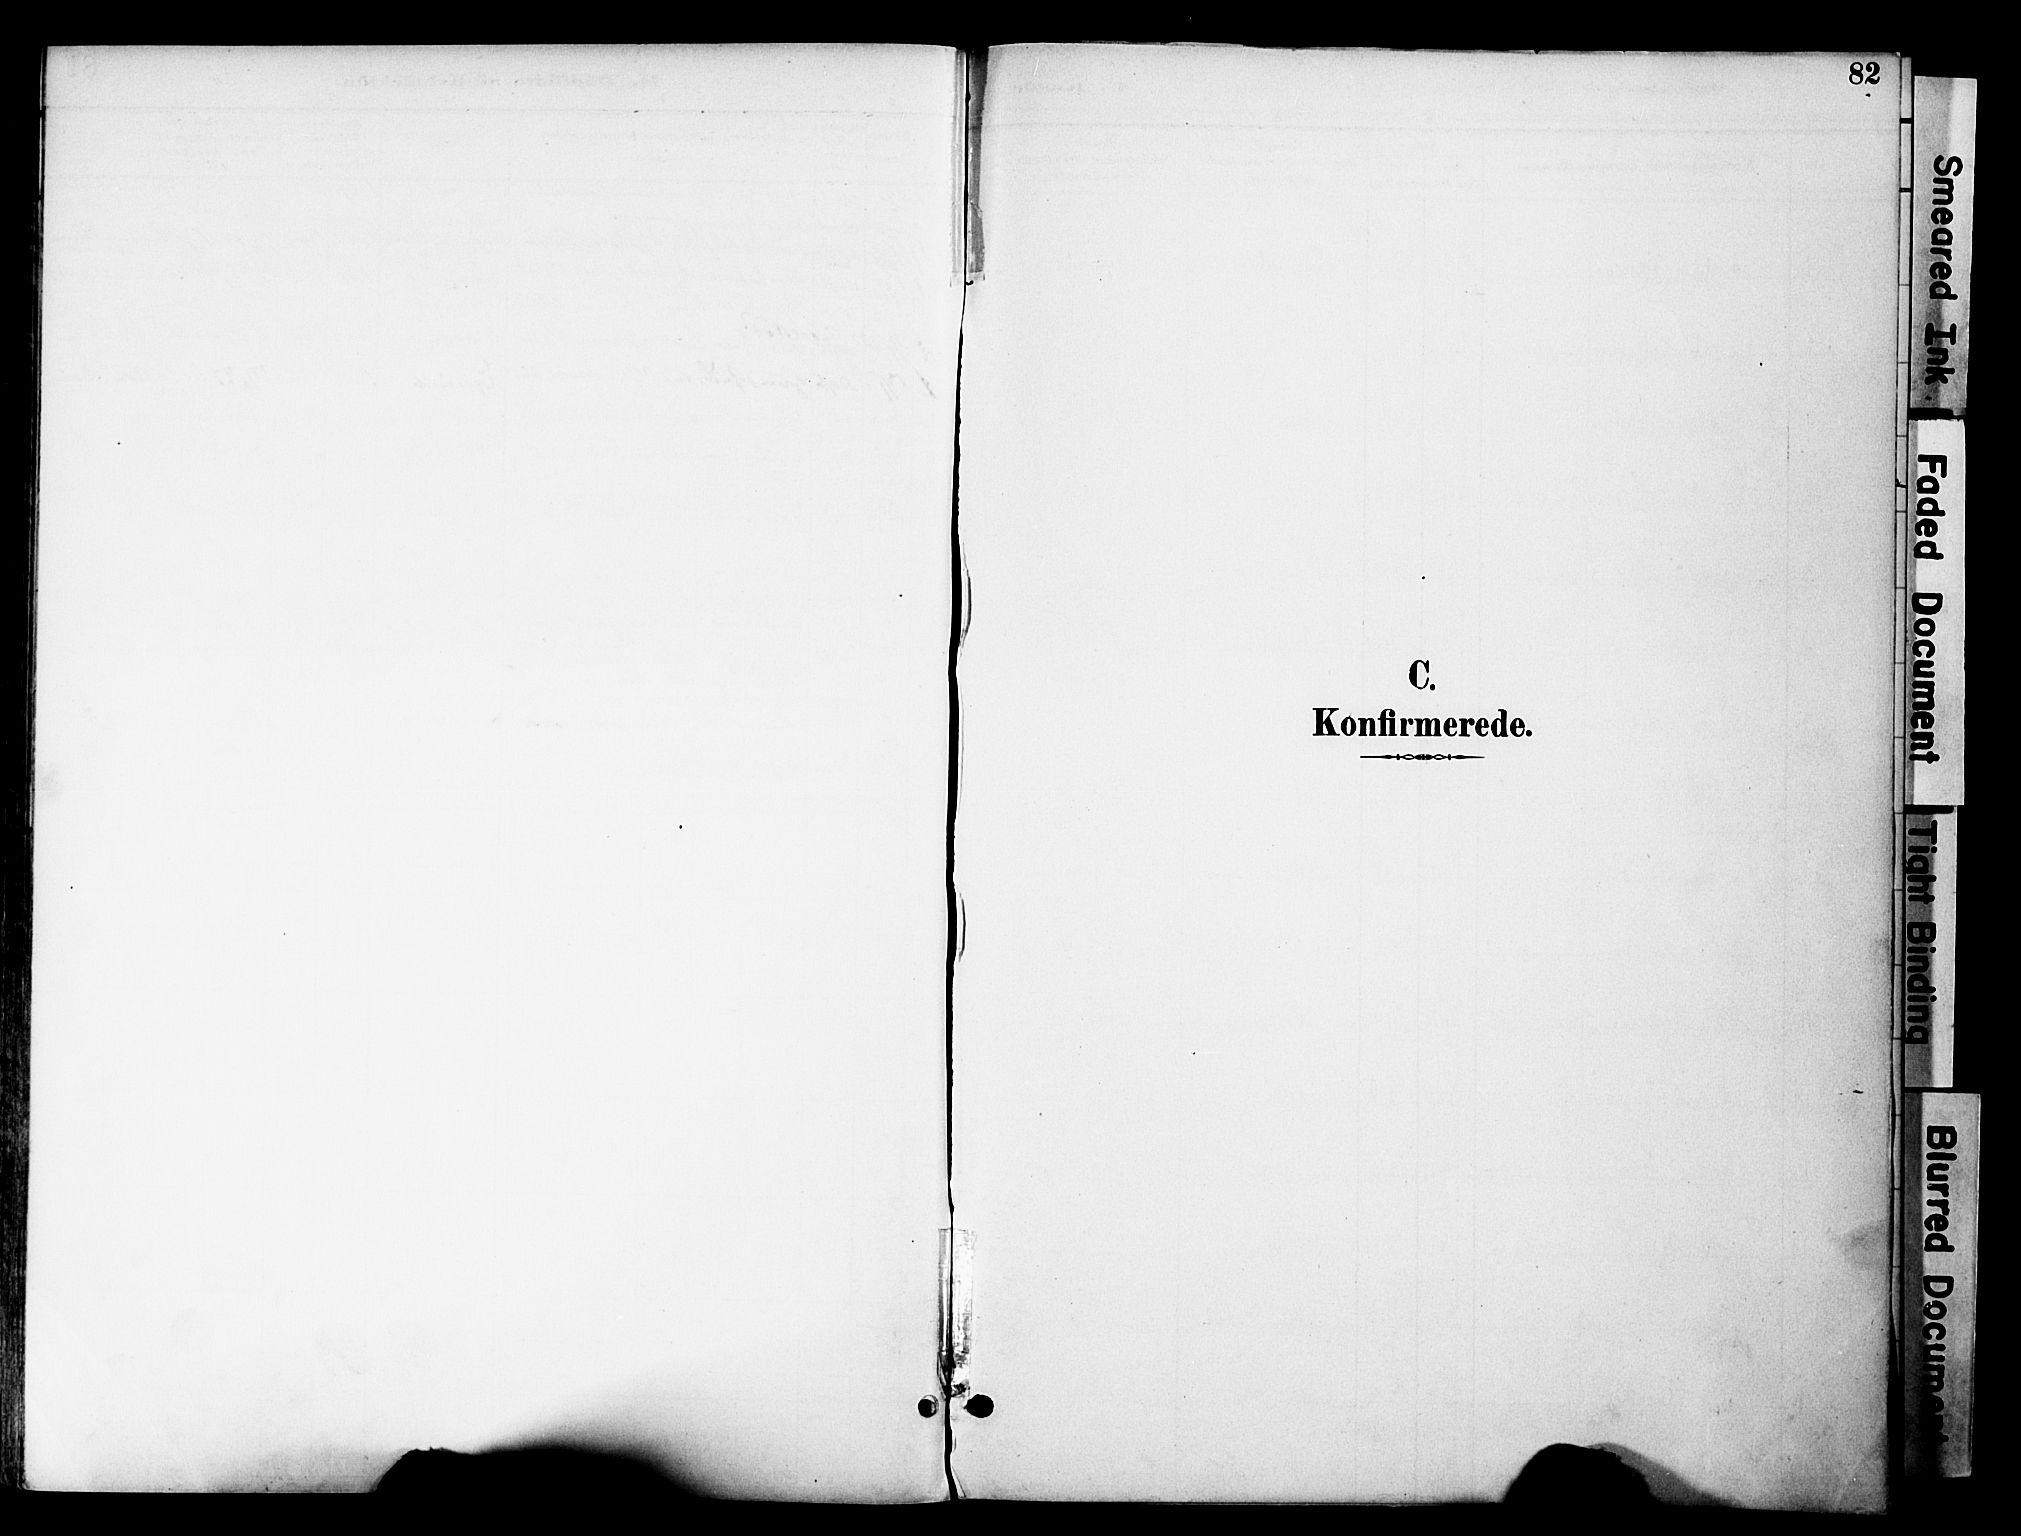 SAH, Gran prestekontor, Ministerialbok nr. 20, 1889-1899, s. 82